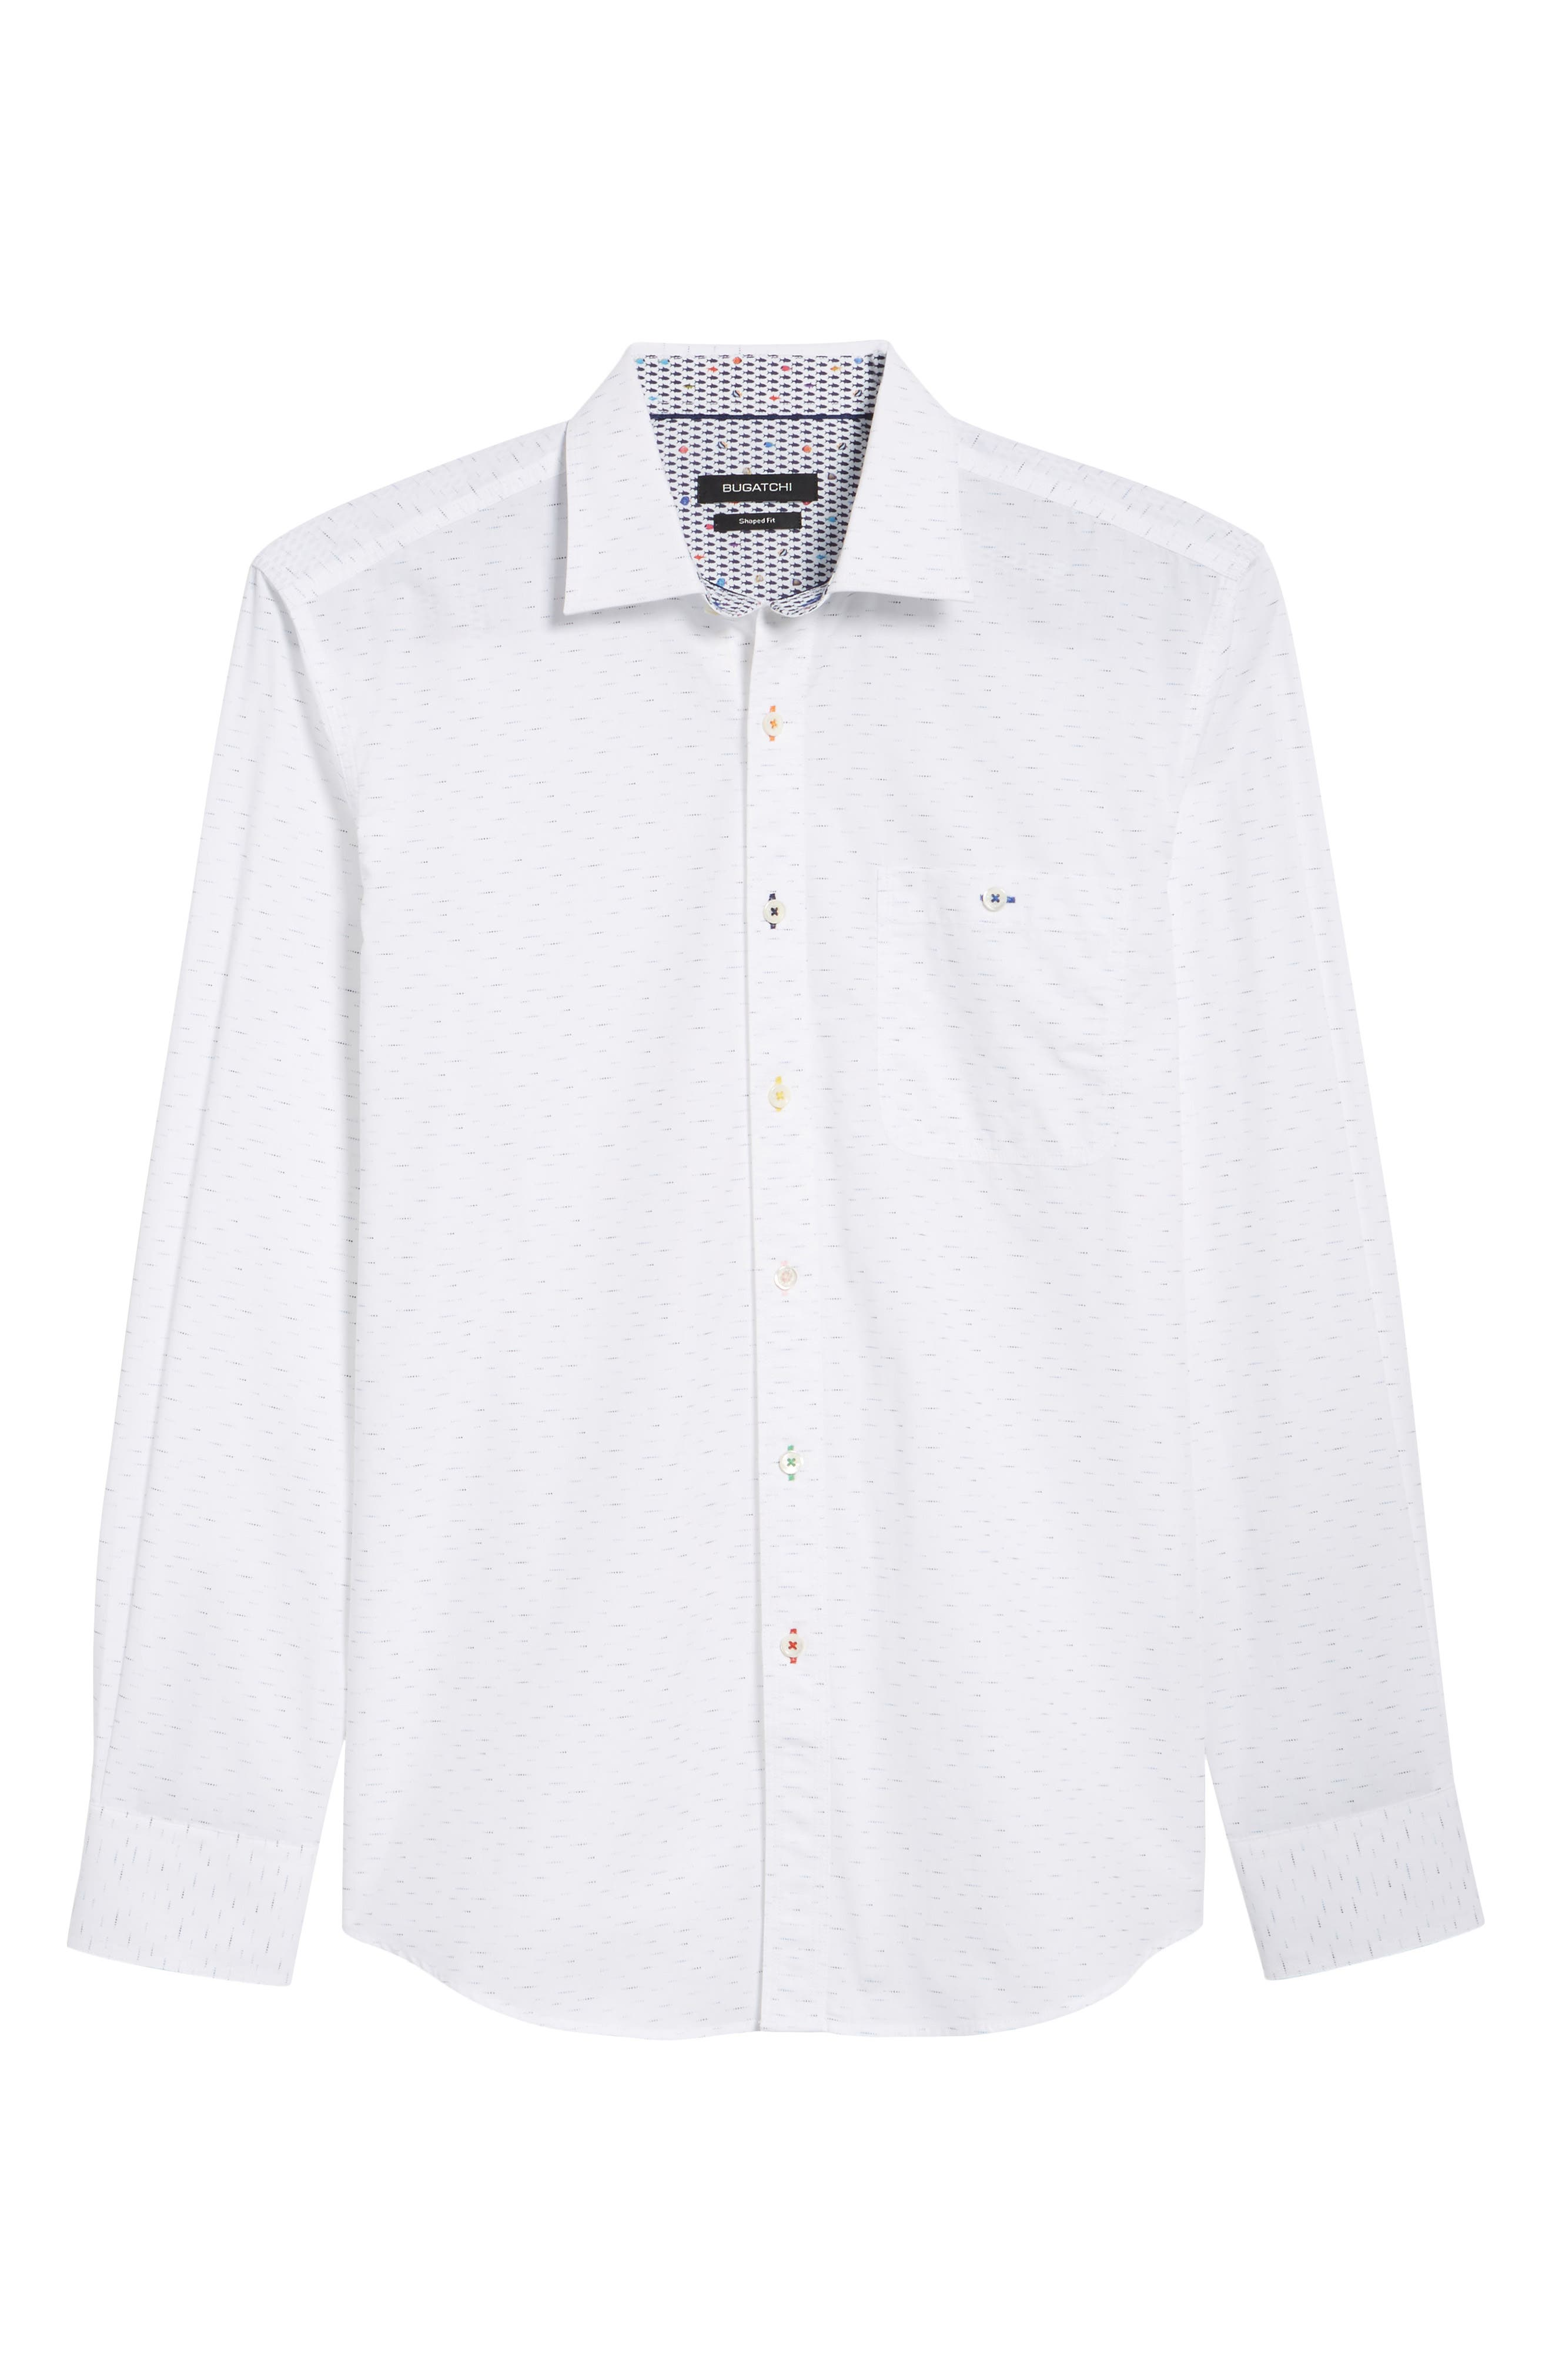 Dots Etc. Shaped Fit Sport Shirt,                             Alternate thumbnail 6, color,                             Chalk